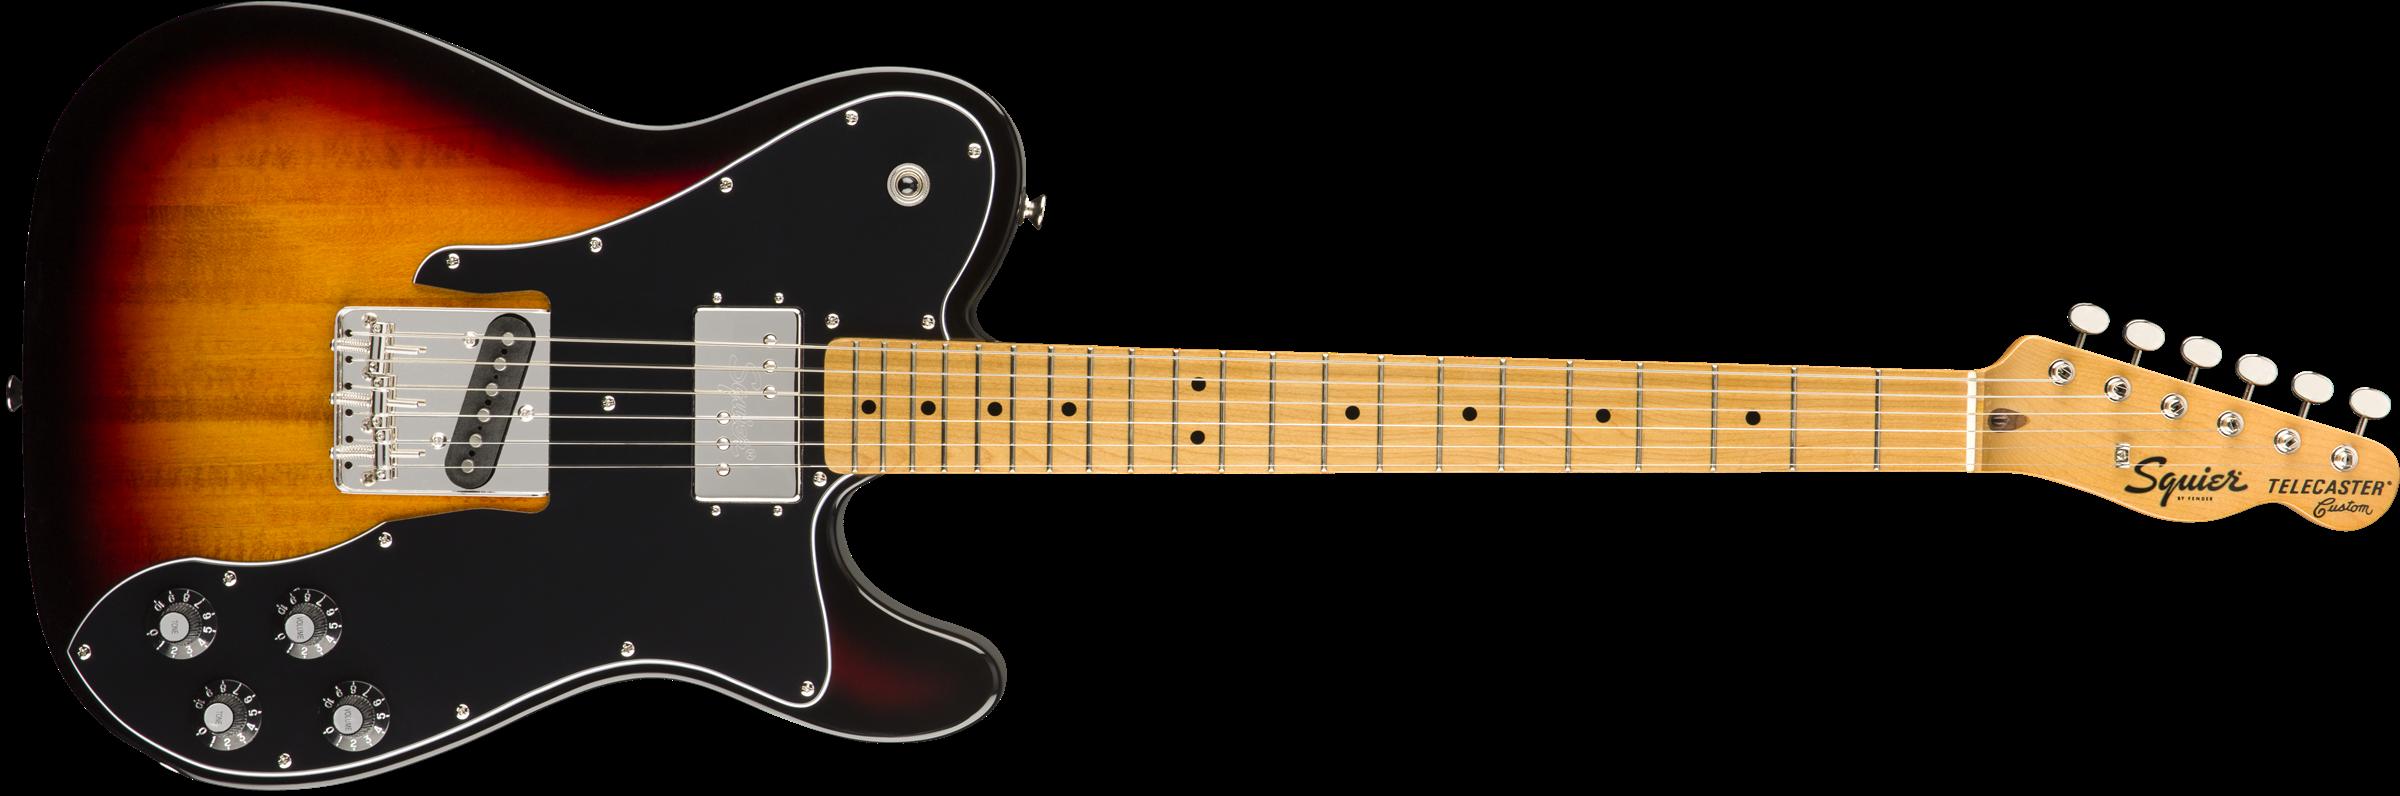 fender squier classic vibe 70 39 s telecaster custom electric guitar sunburst demo 885978064502 ebay. Black Bedroom Furniture Sets. Home Design Ideas